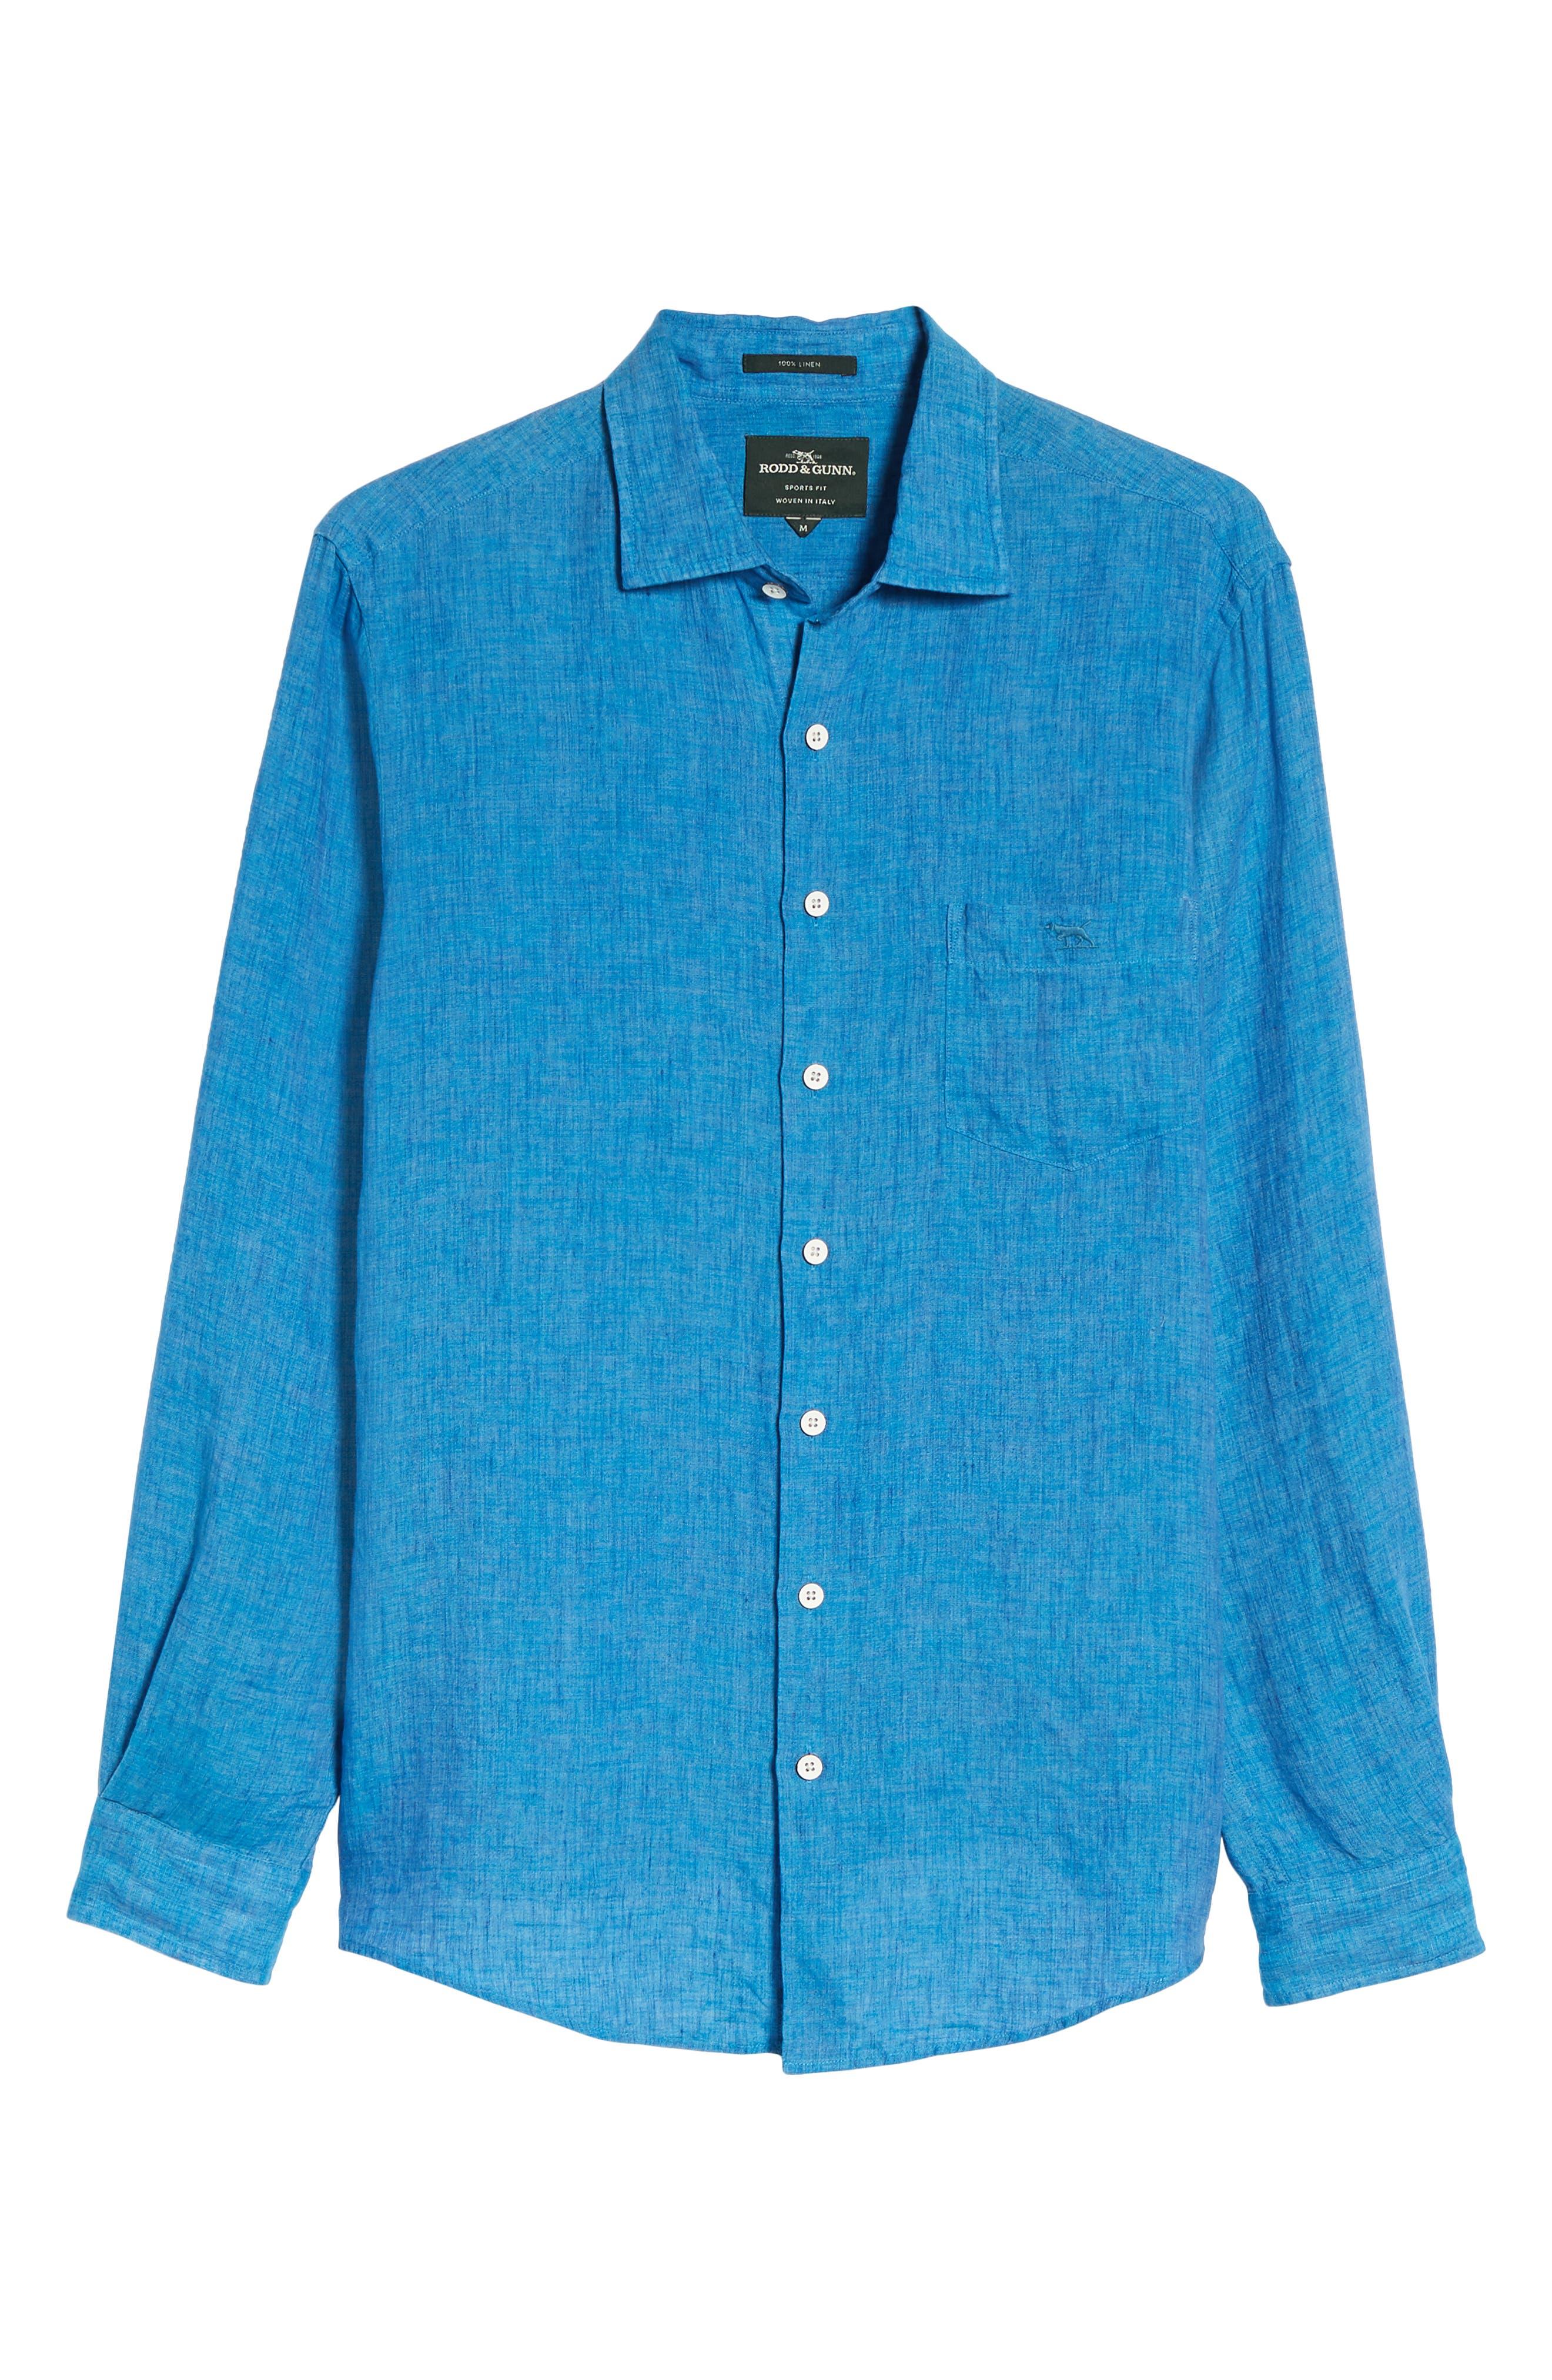 RODD & GUNN,                             Harris Bay Regular Fit Linen Sport Shirt,                             Alternate thumbnail 6, color,                             438